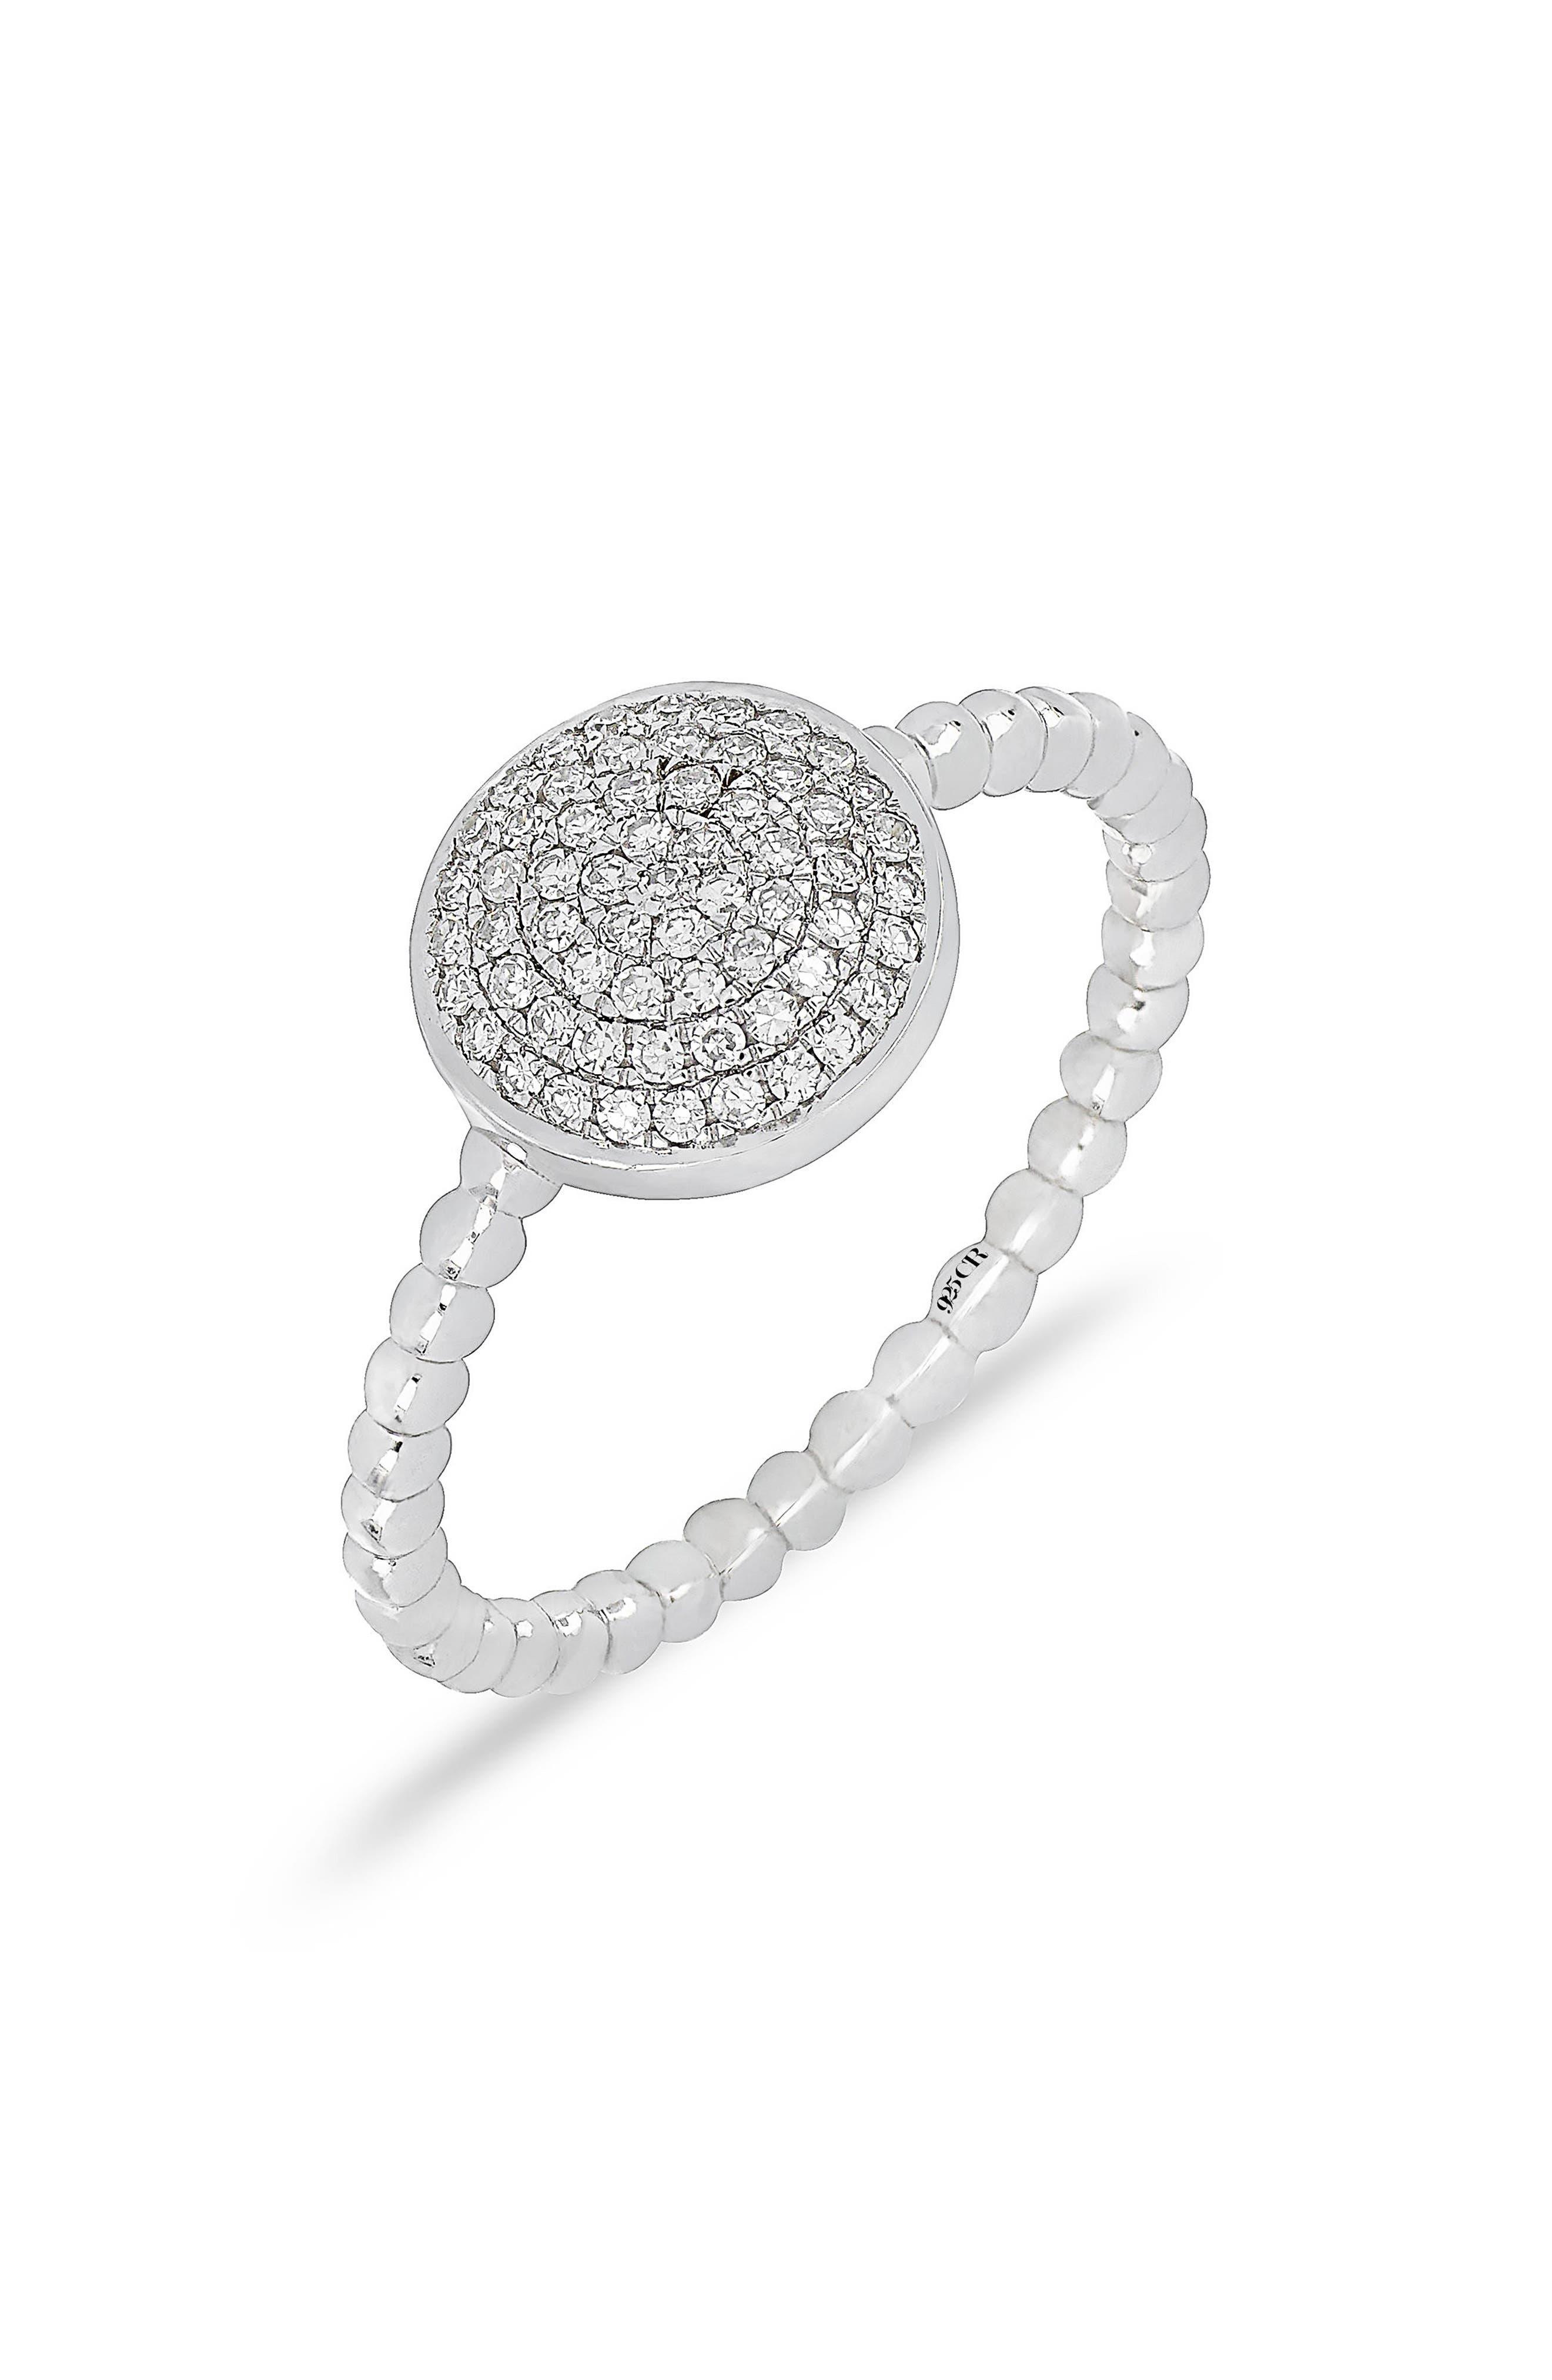 Main Image - Carrière Pavé Diamond Disc Ring (Nordstrom Exclusive)